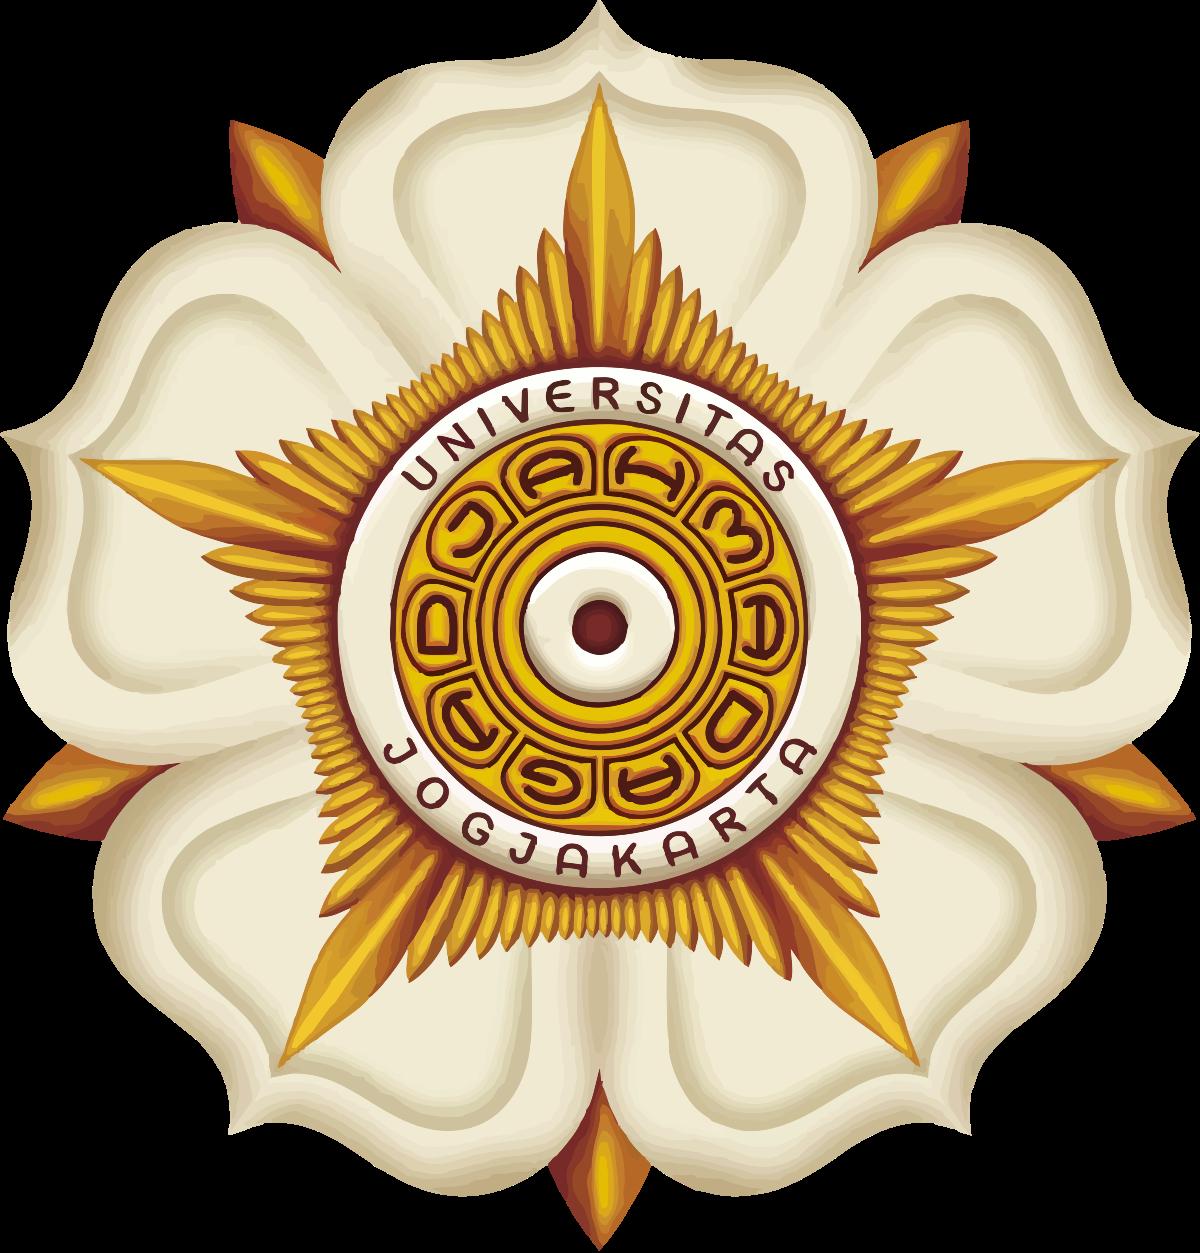 Emblem_of_Universitas_Gadjah_Mada